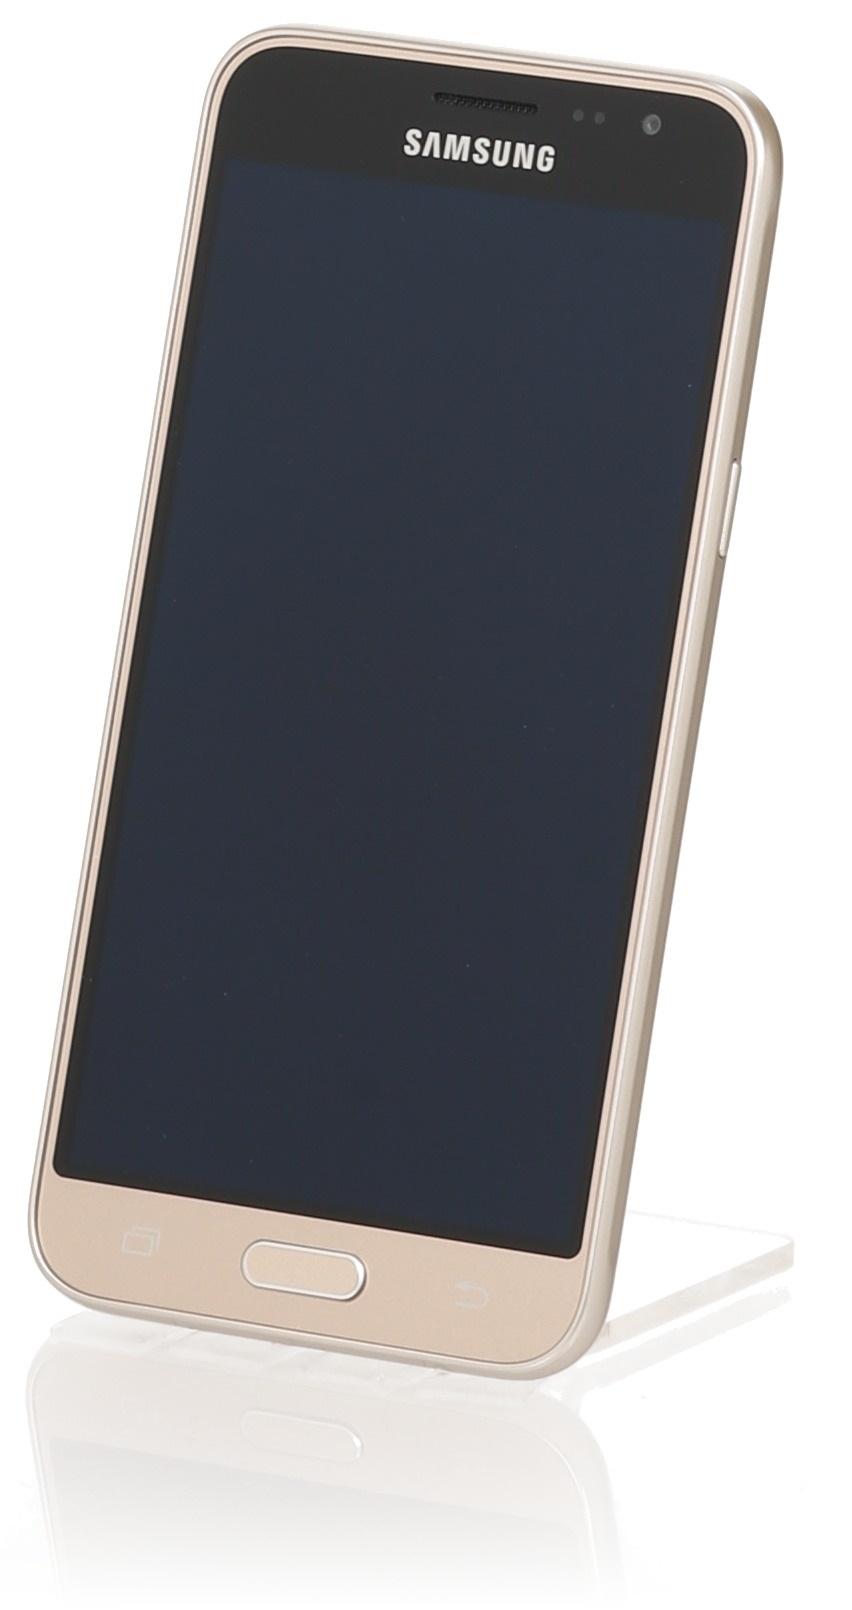 Samsung J320F Galaxy J3 (2016) DUOS 8GB gold